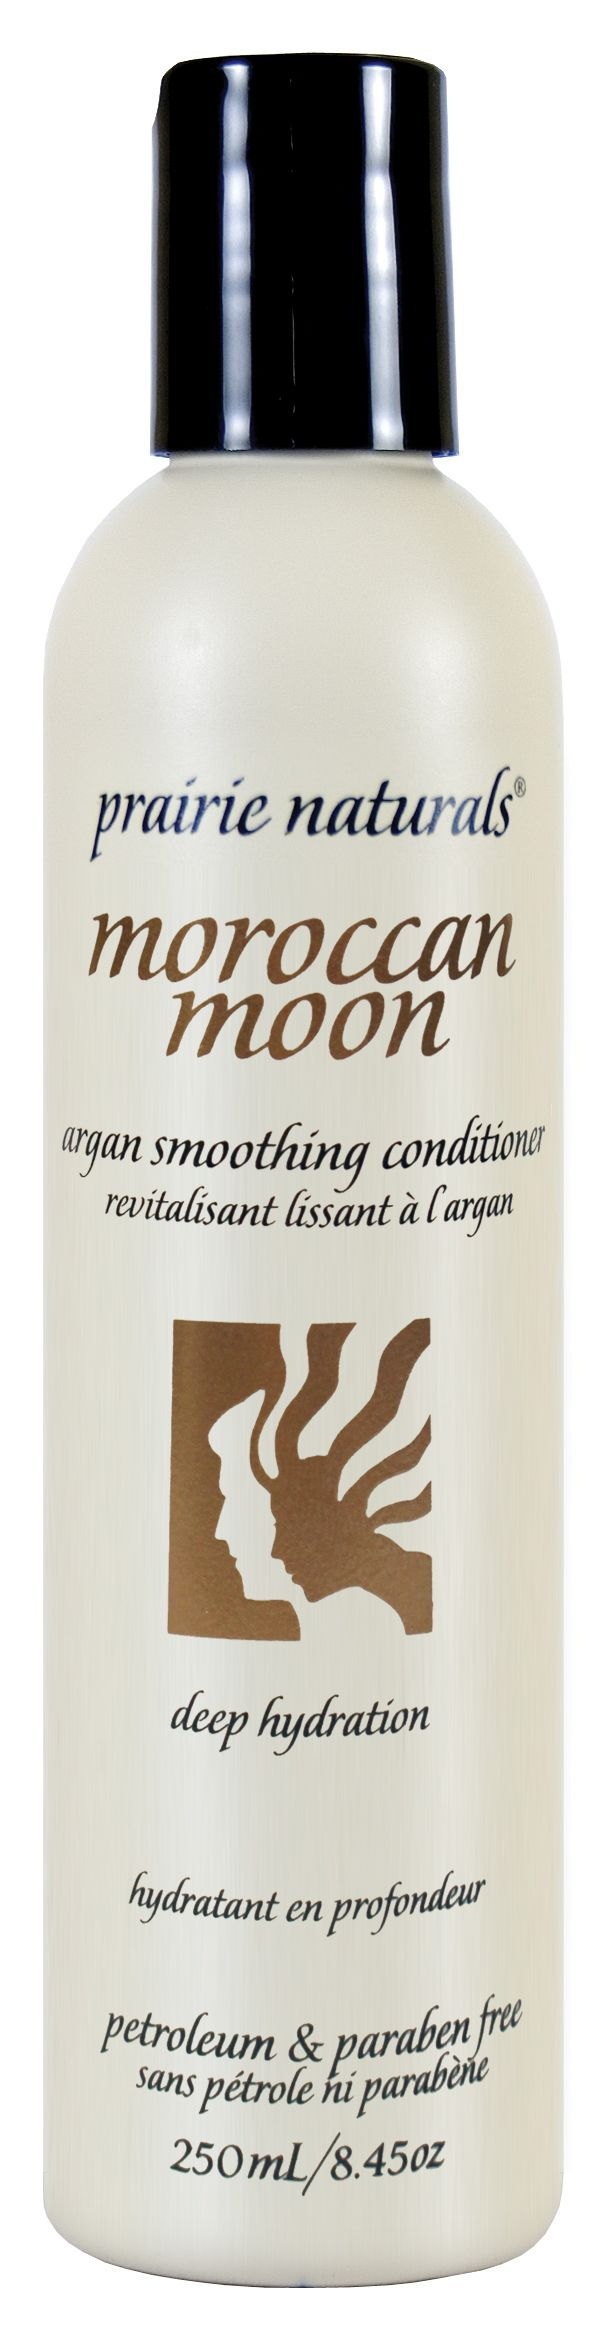 Moroccan Moon Argan Smoothing Conditioner. Deep hydration. Petroleum & Paraben Free.